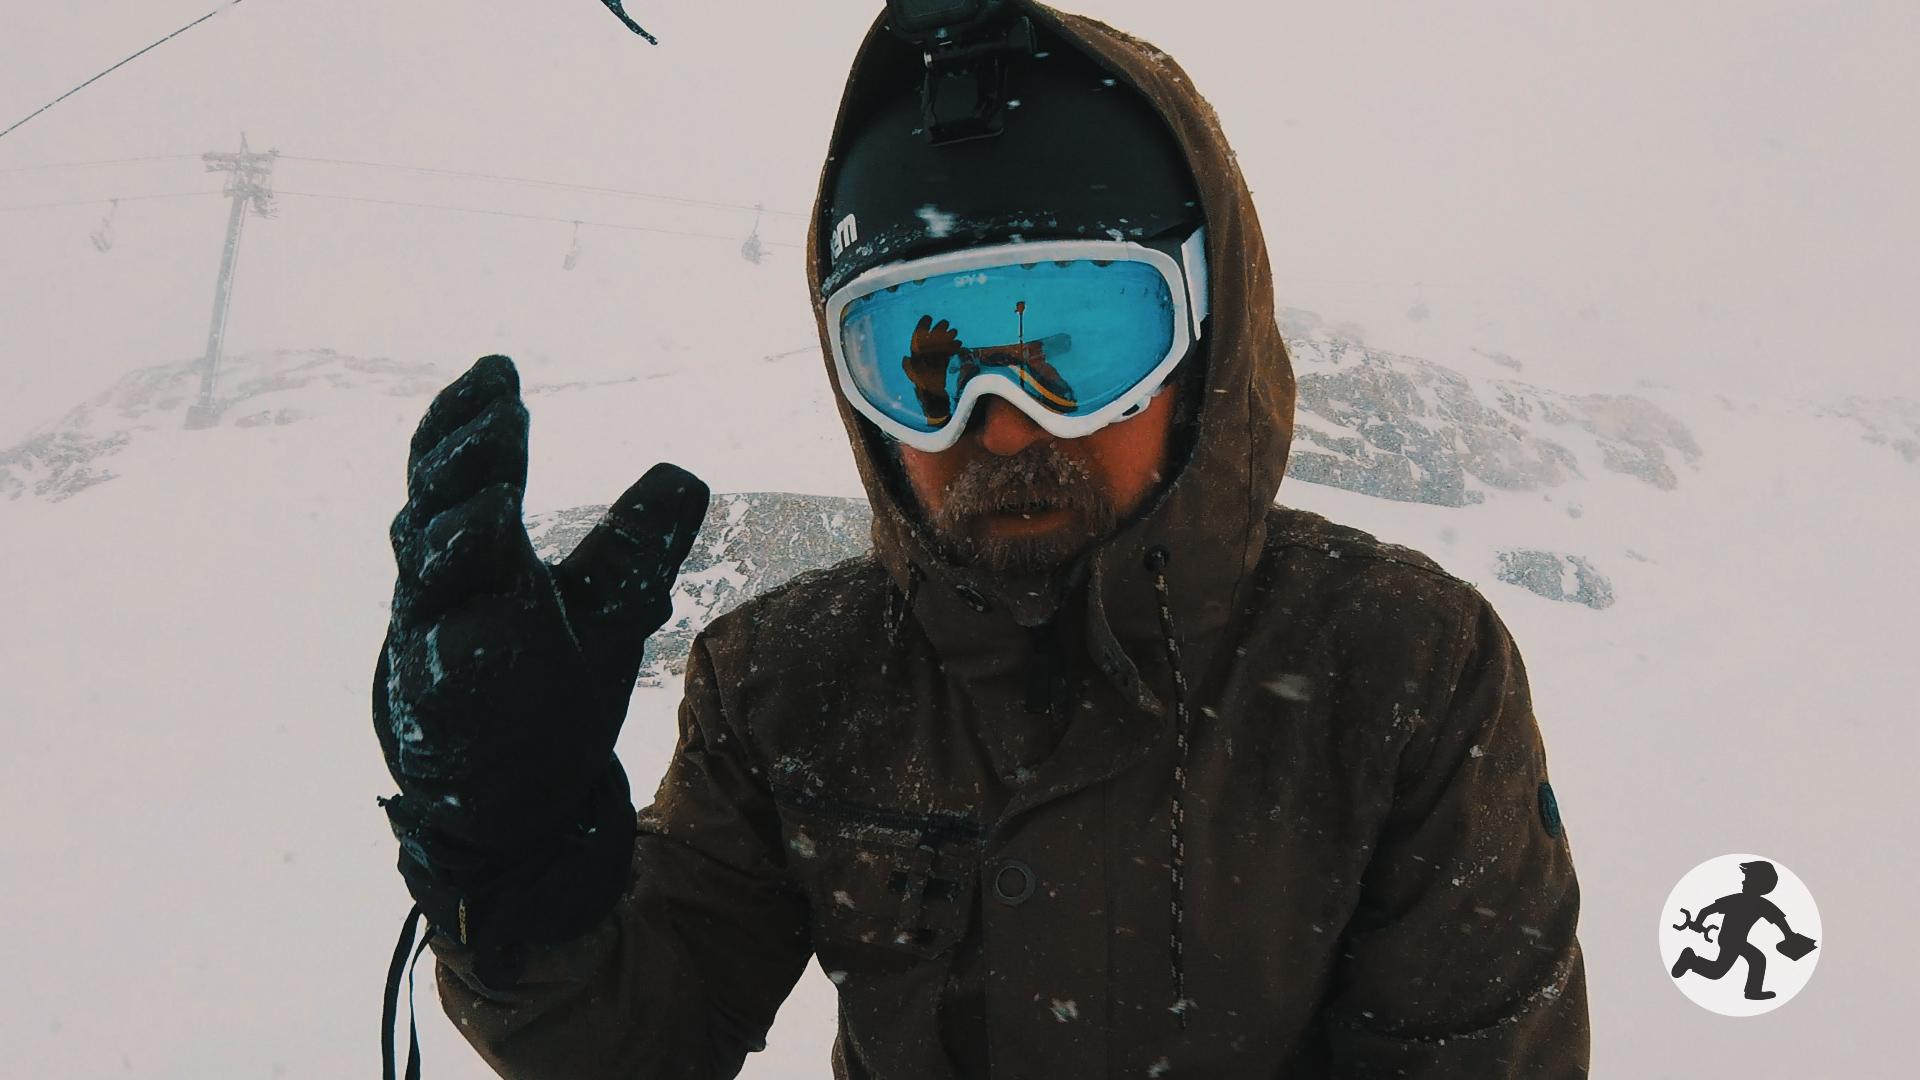 Snow Blind